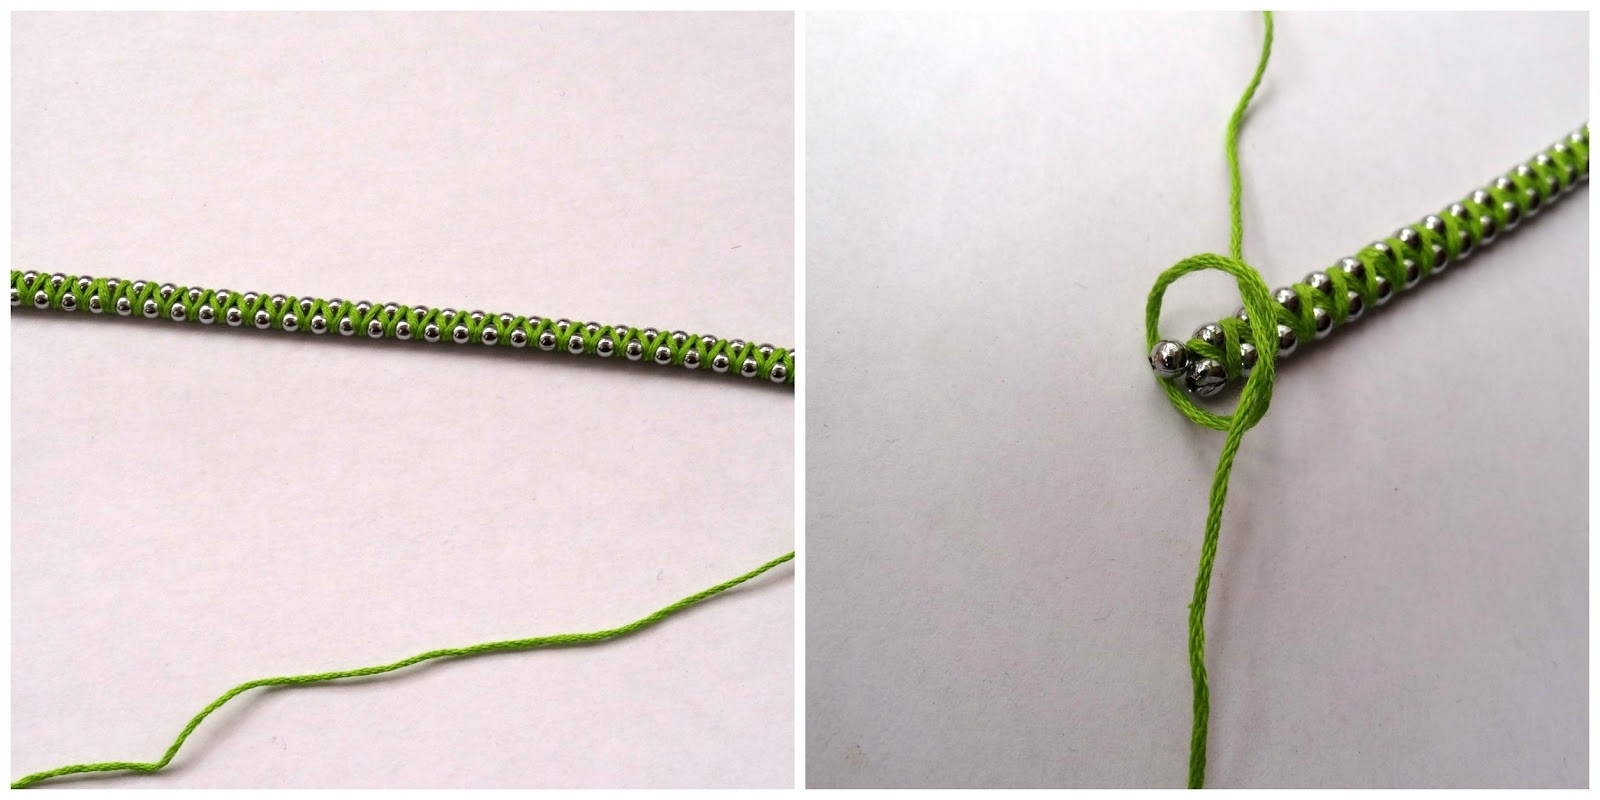 DIY-Rainbow-Friendship-Bracelet04.jpg